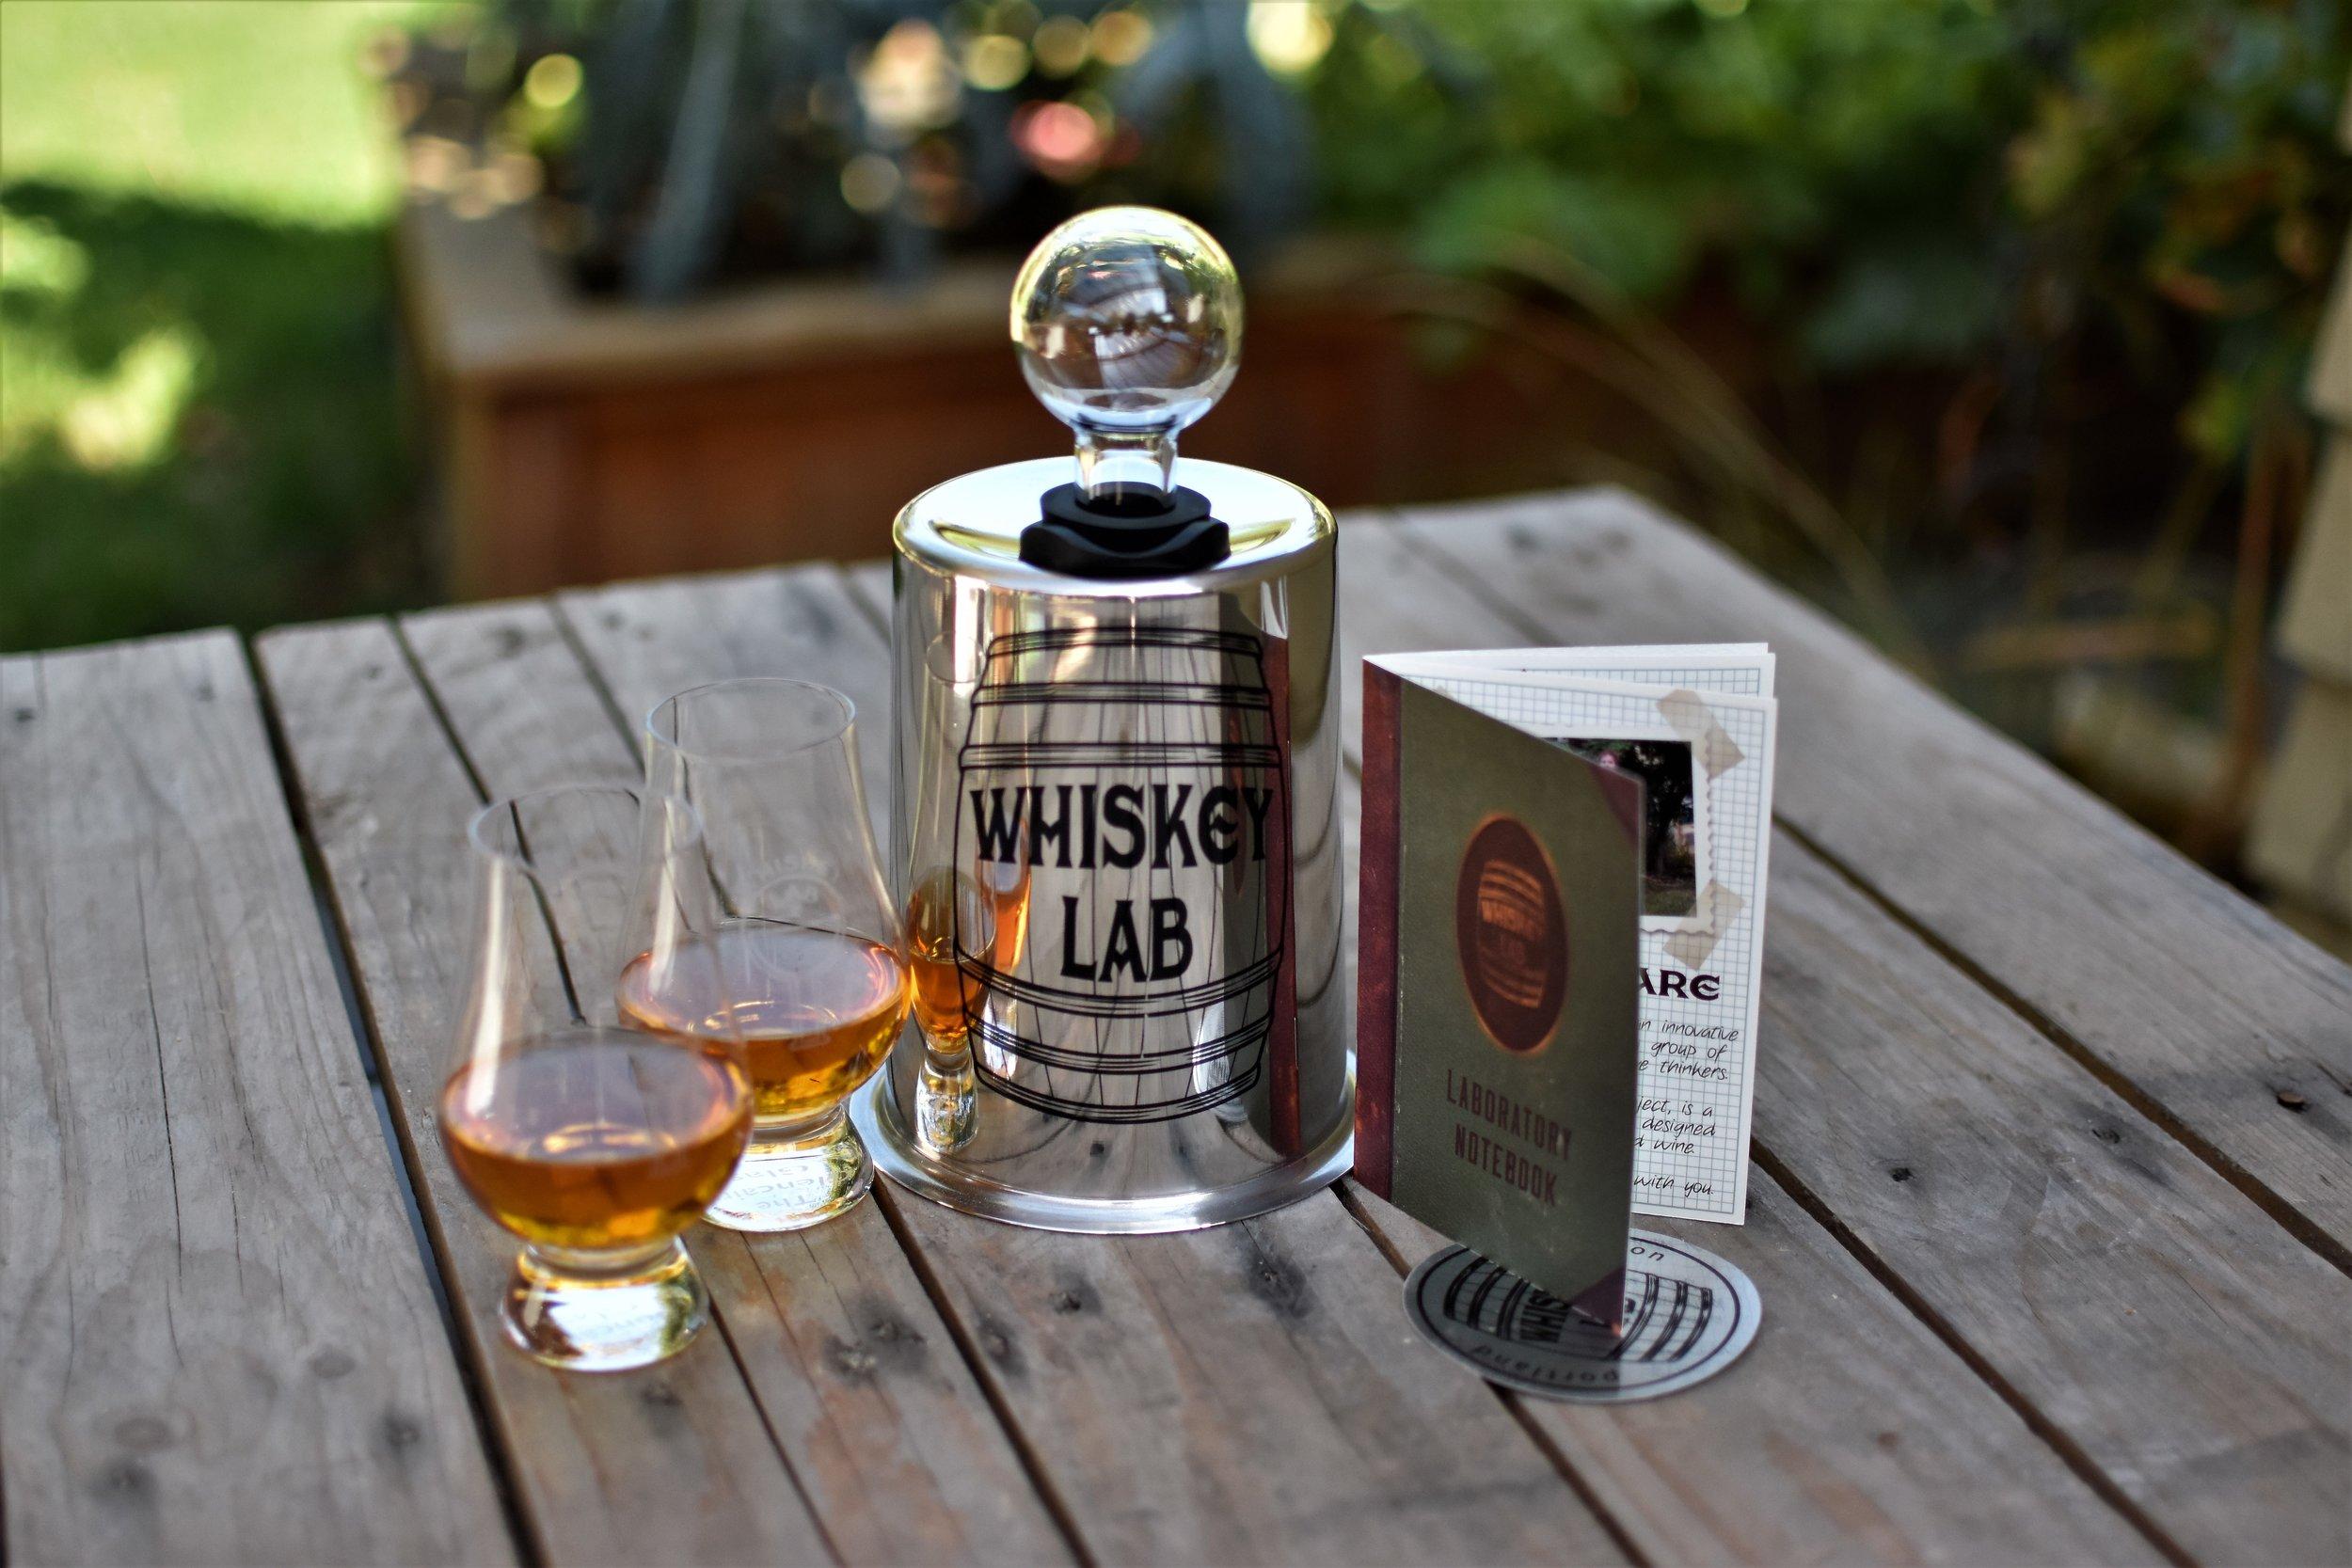 08_Whiskey Lab Gift Pack with full glasses.jpg